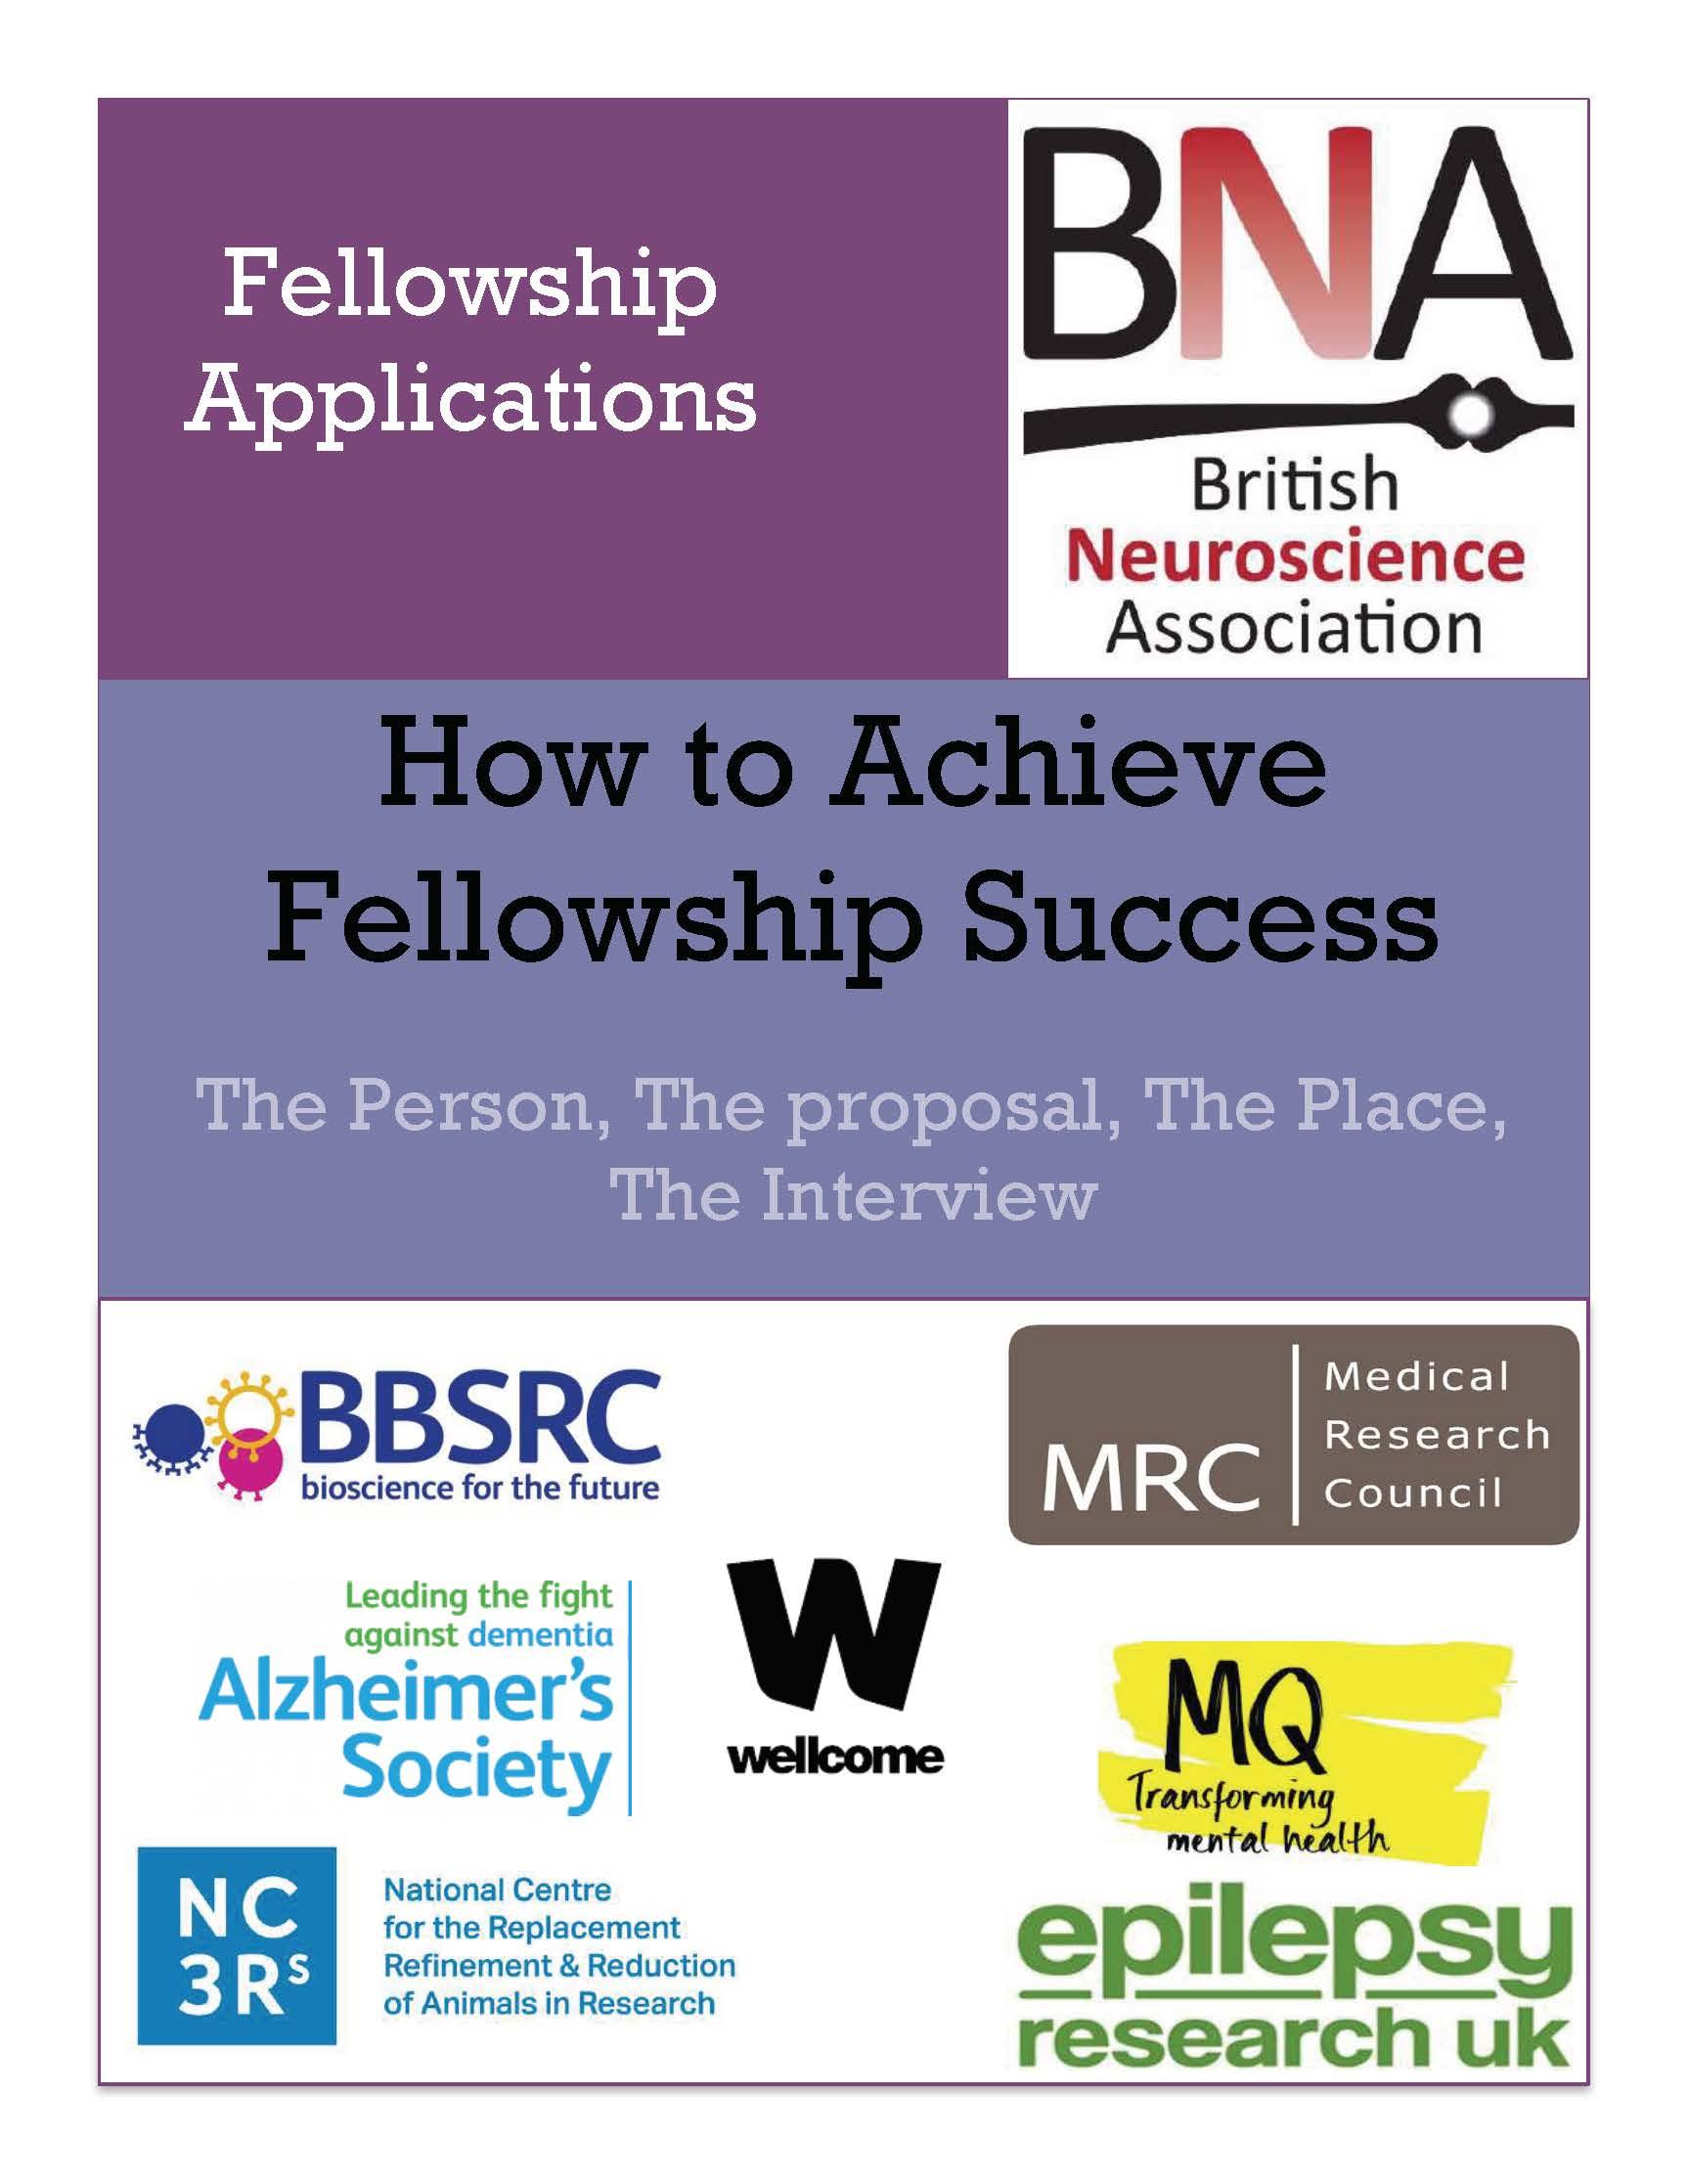 British Neuroscience Association Training Careers Jobs And